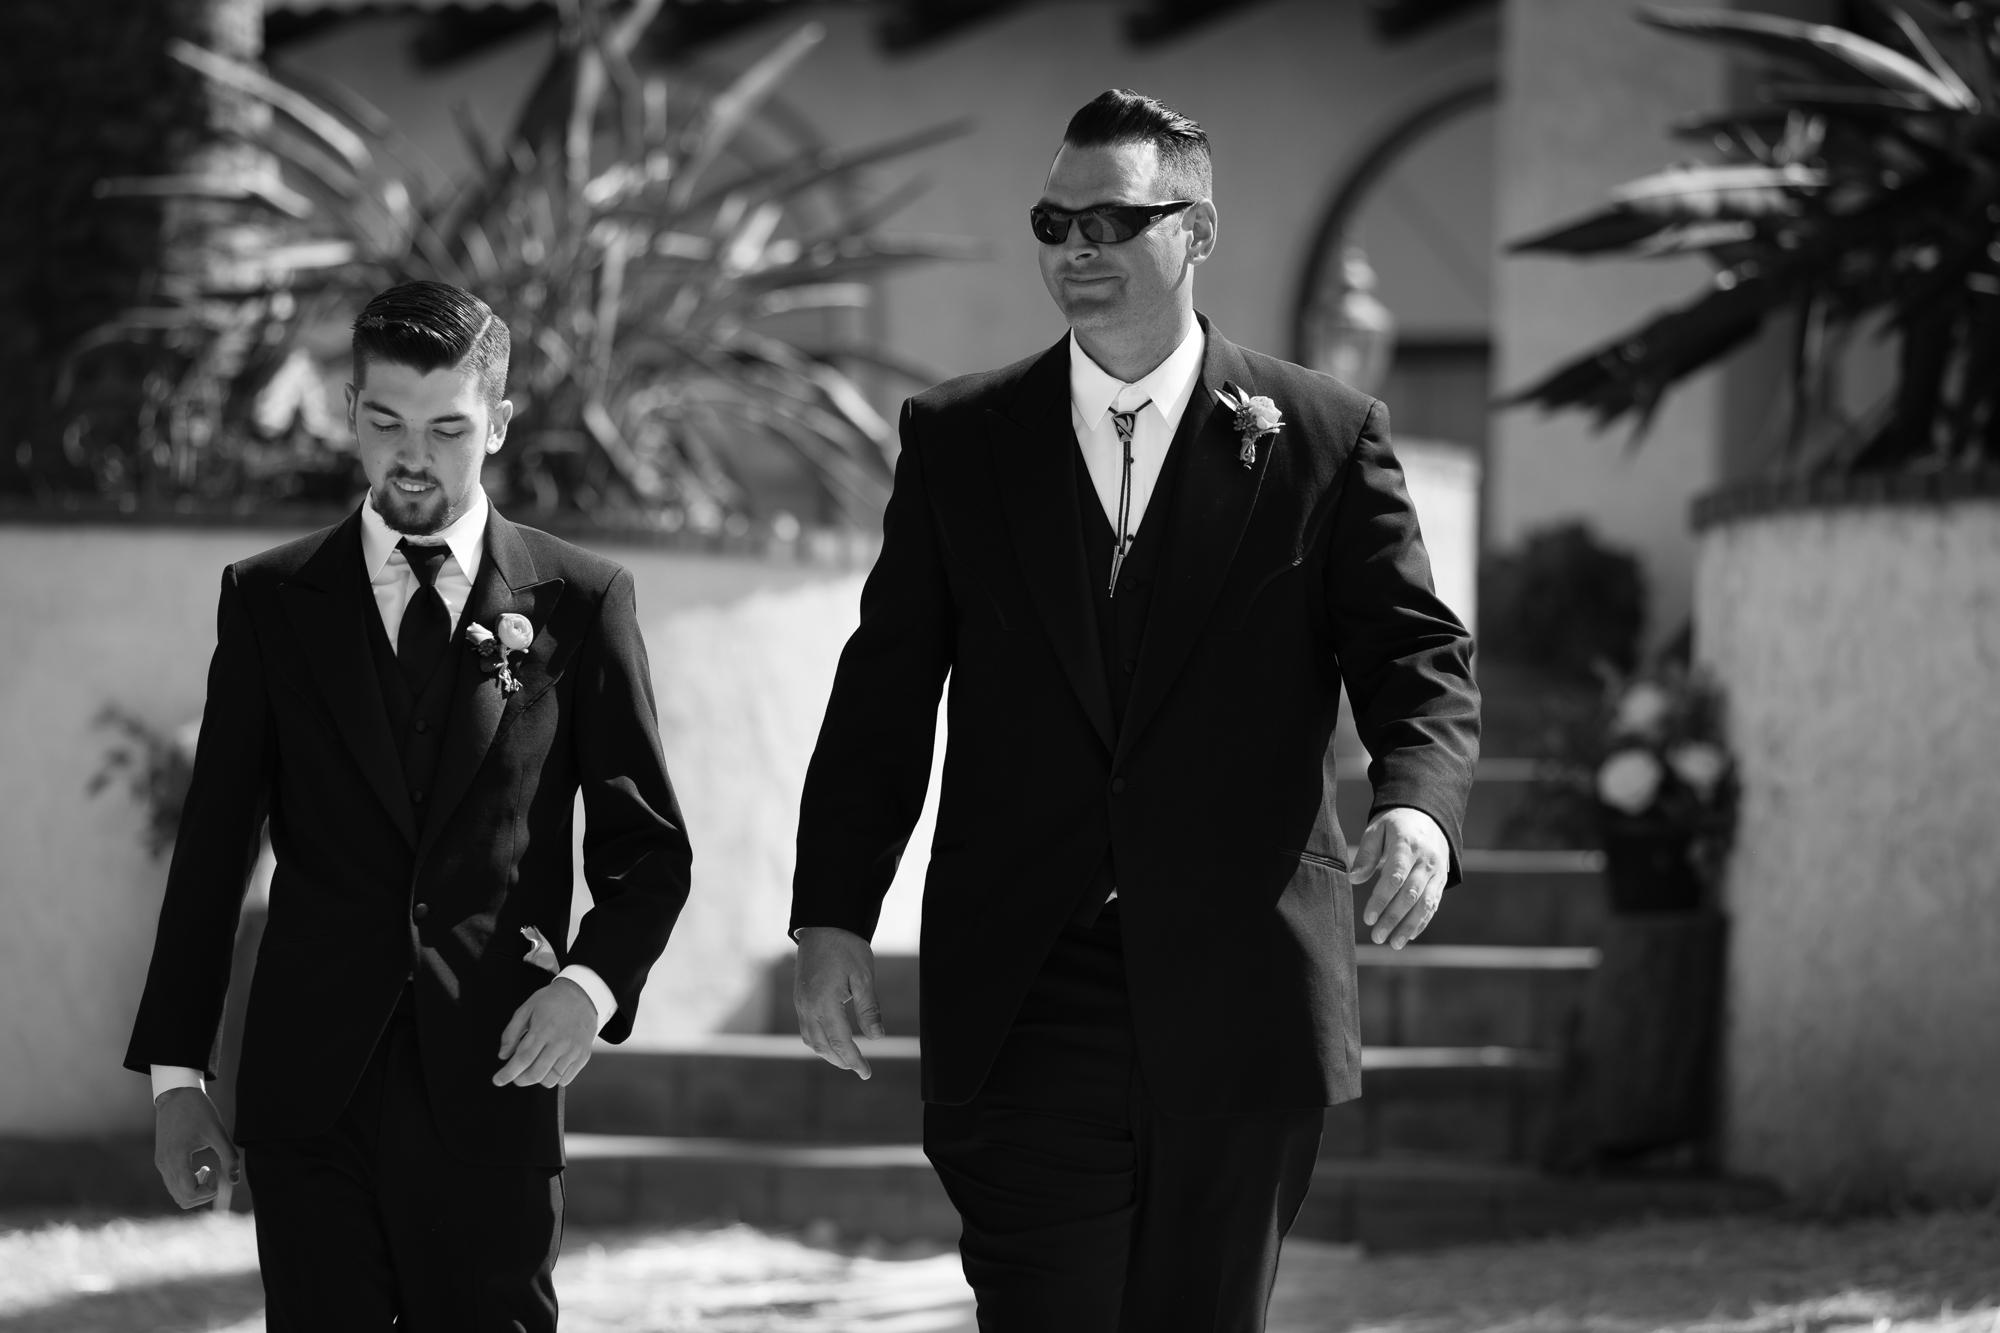 Gary-Kasl-SandKasl-Imaging-Wedding-Photography-21.jpg